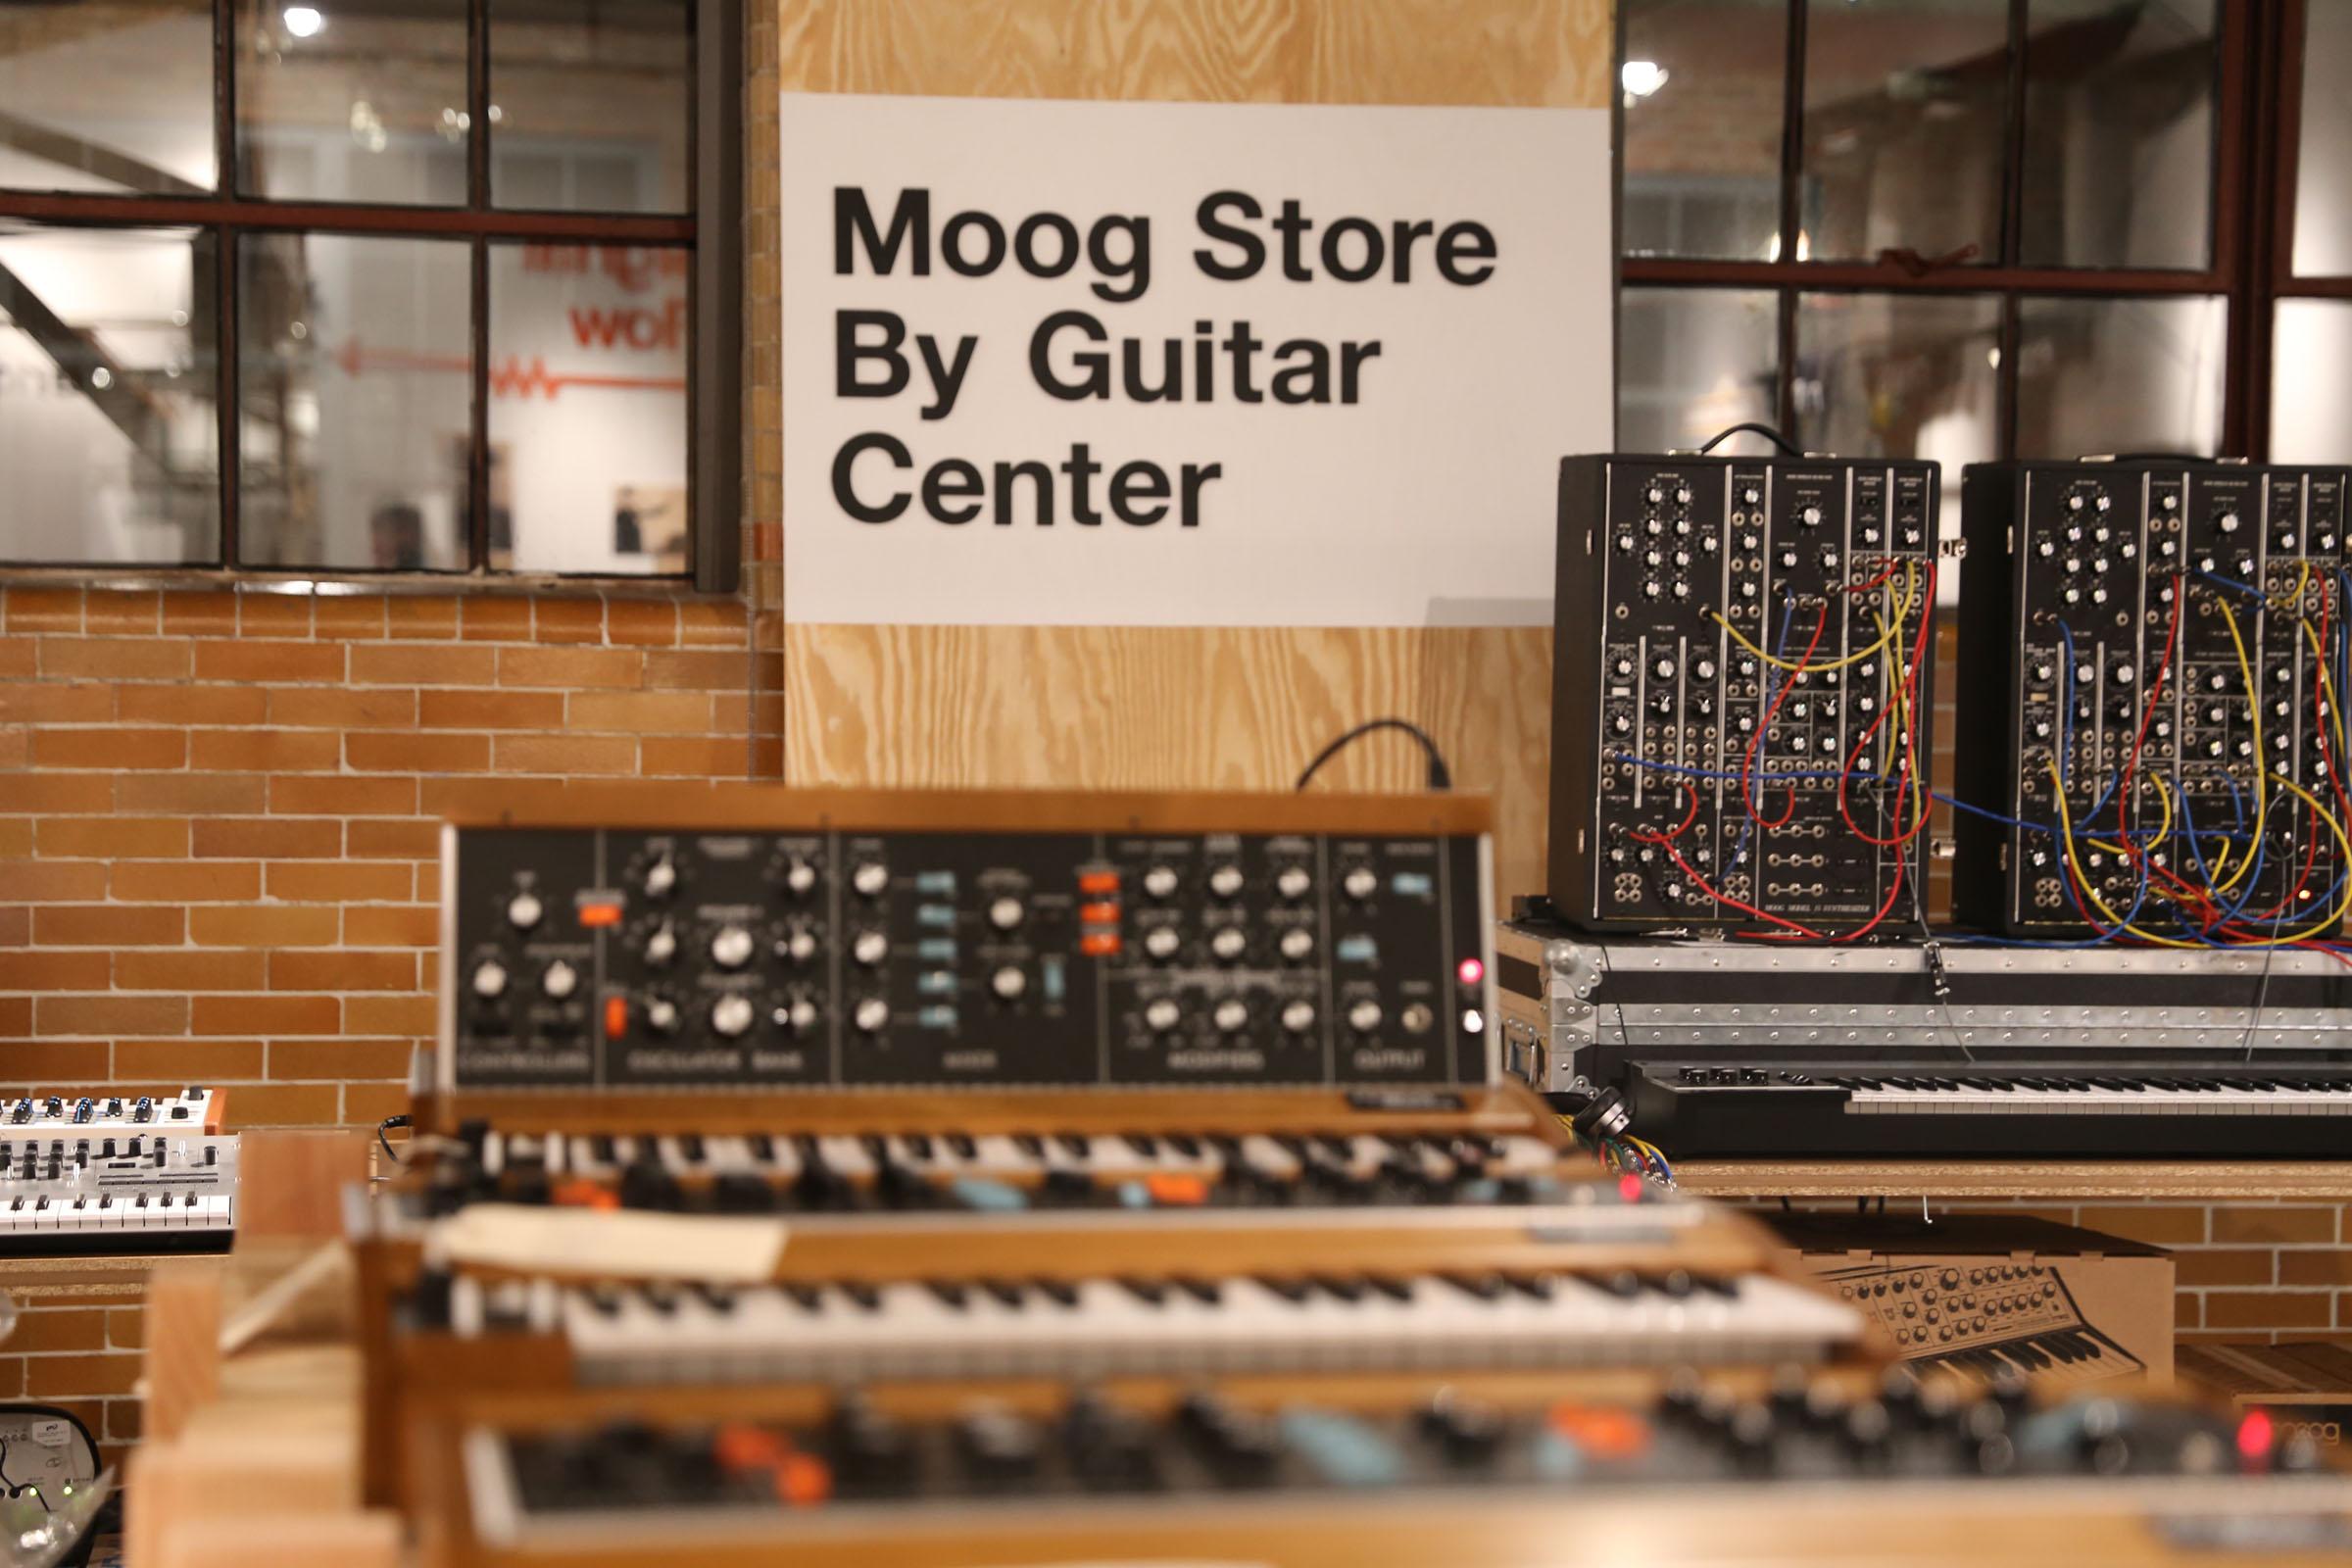 guitar center named exclusive retail partner for moogfest 2016 live design briefing room press. Black Bedroom Furniture Sets. Home Design Ideas